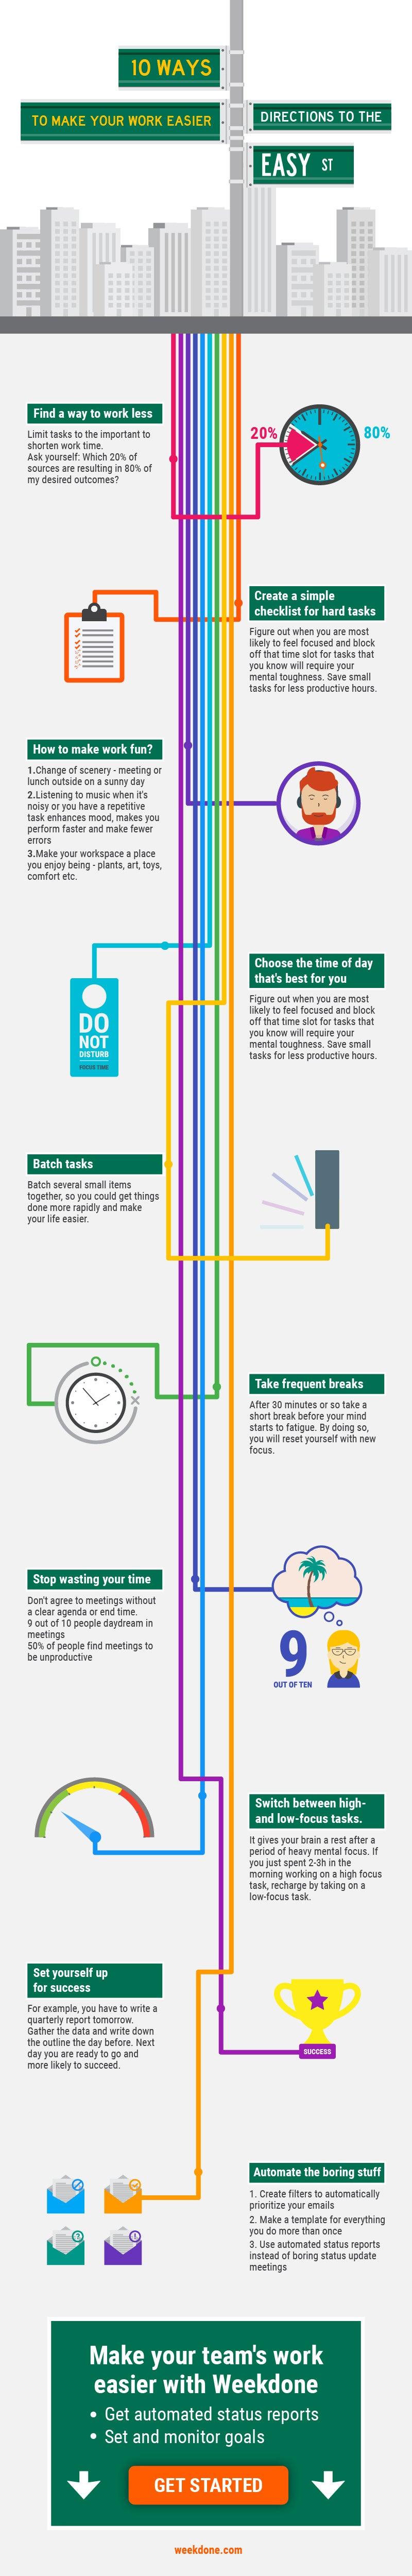 https://assets.entrepreneur.com/images/misc/1477666122_10-ways-work-easier-infographic.jpg